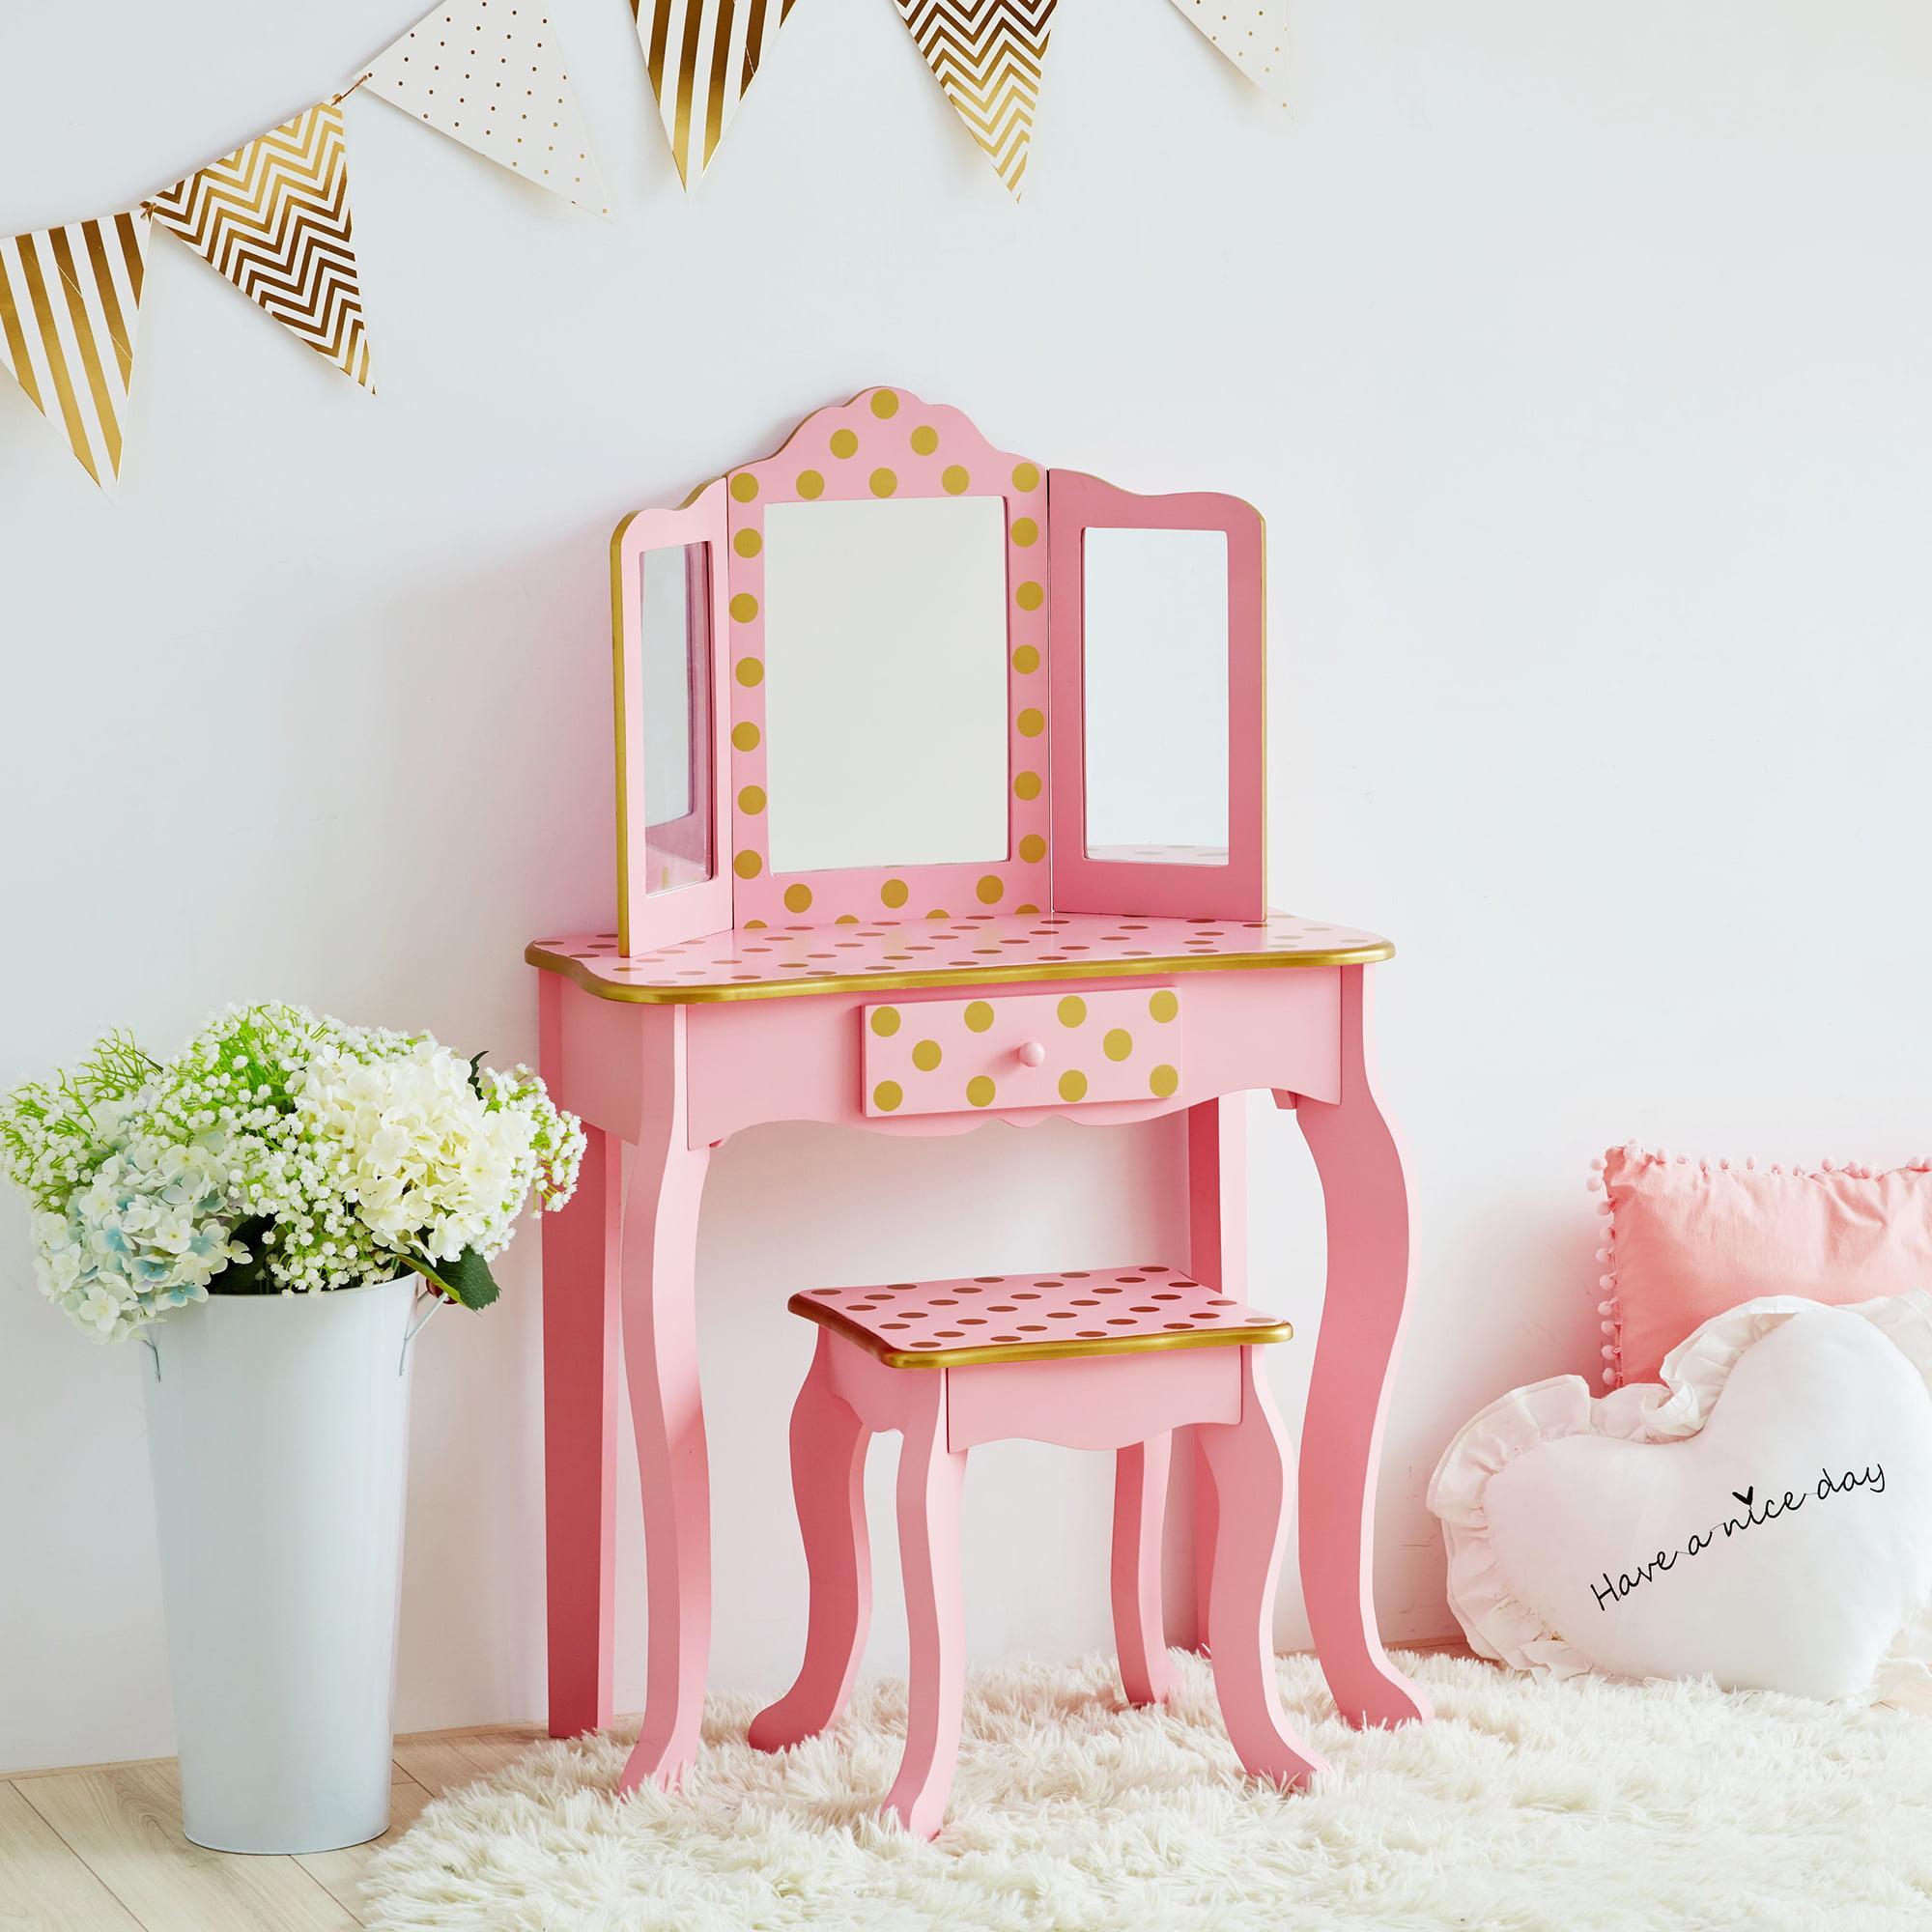 Teamson Kids - Fashion Polka Dot Prints Gisele Toy Vanity Set - Pink / Rose gold